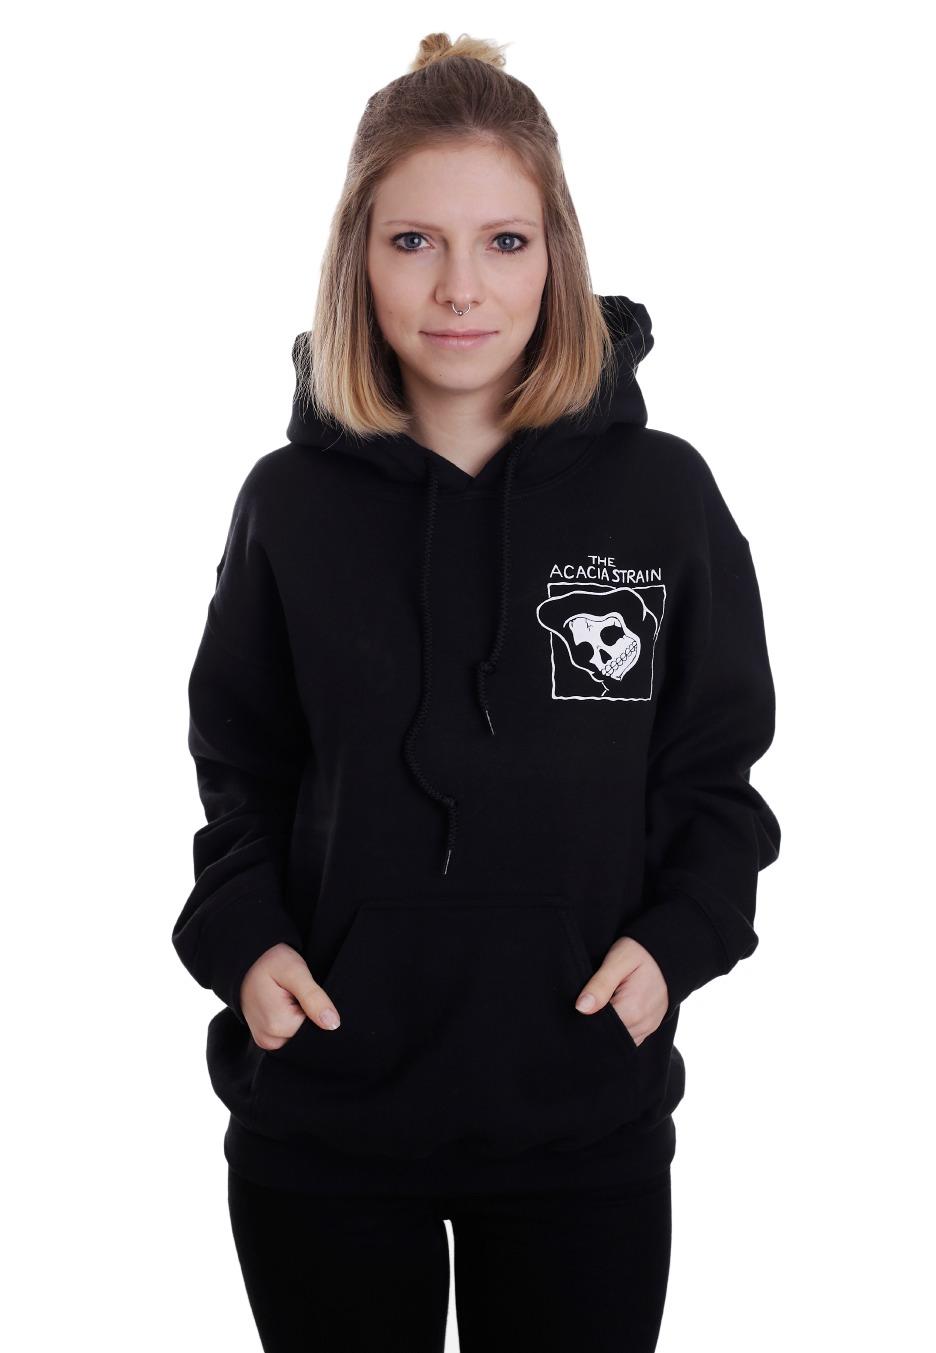 The acacia strain hoodie